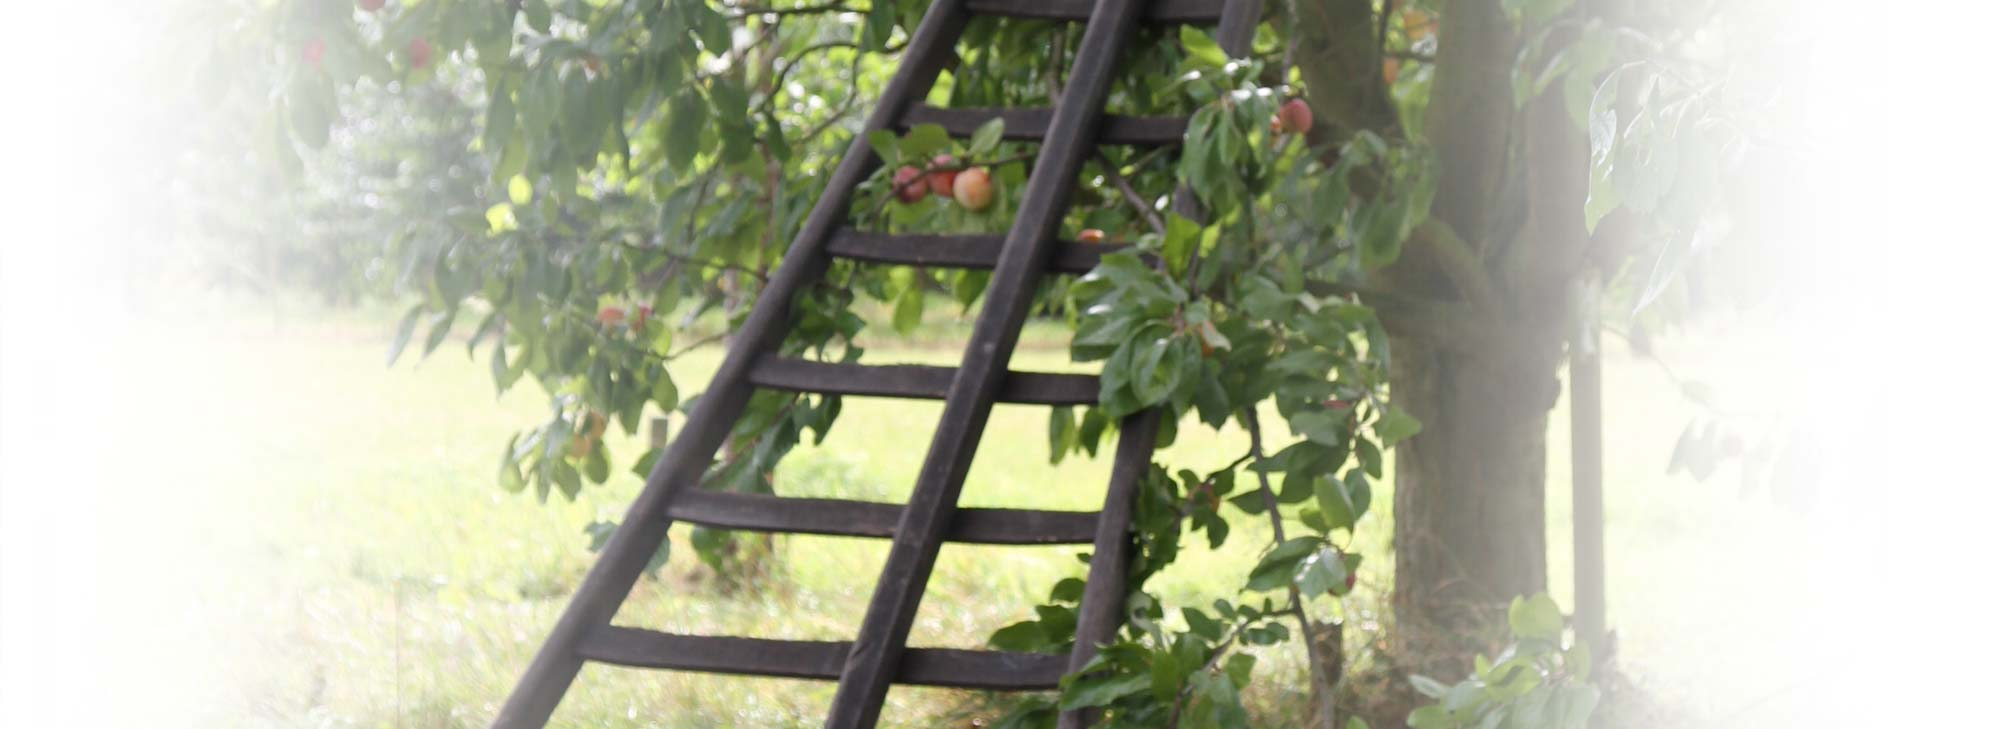 slider-landgoed-appelboom-trap